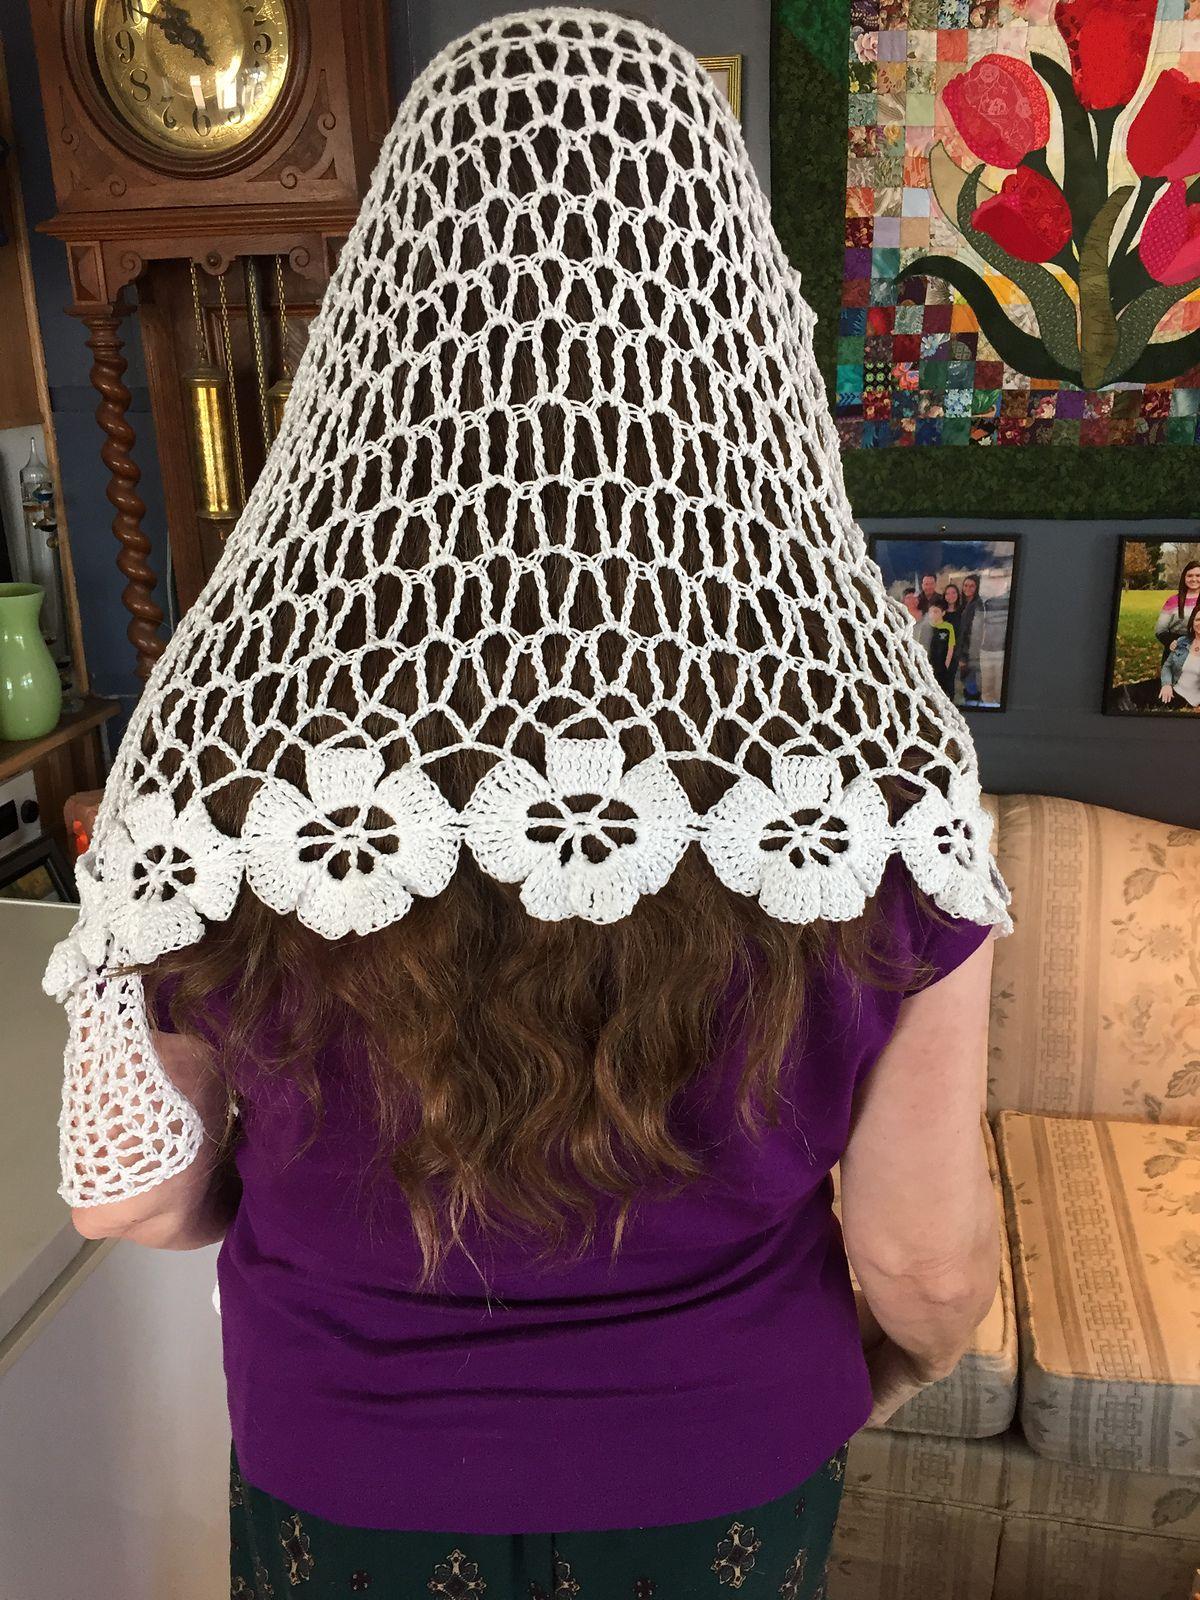 Bridal Shawl pattern by Karin Iden | Shawl crochet pattern ...